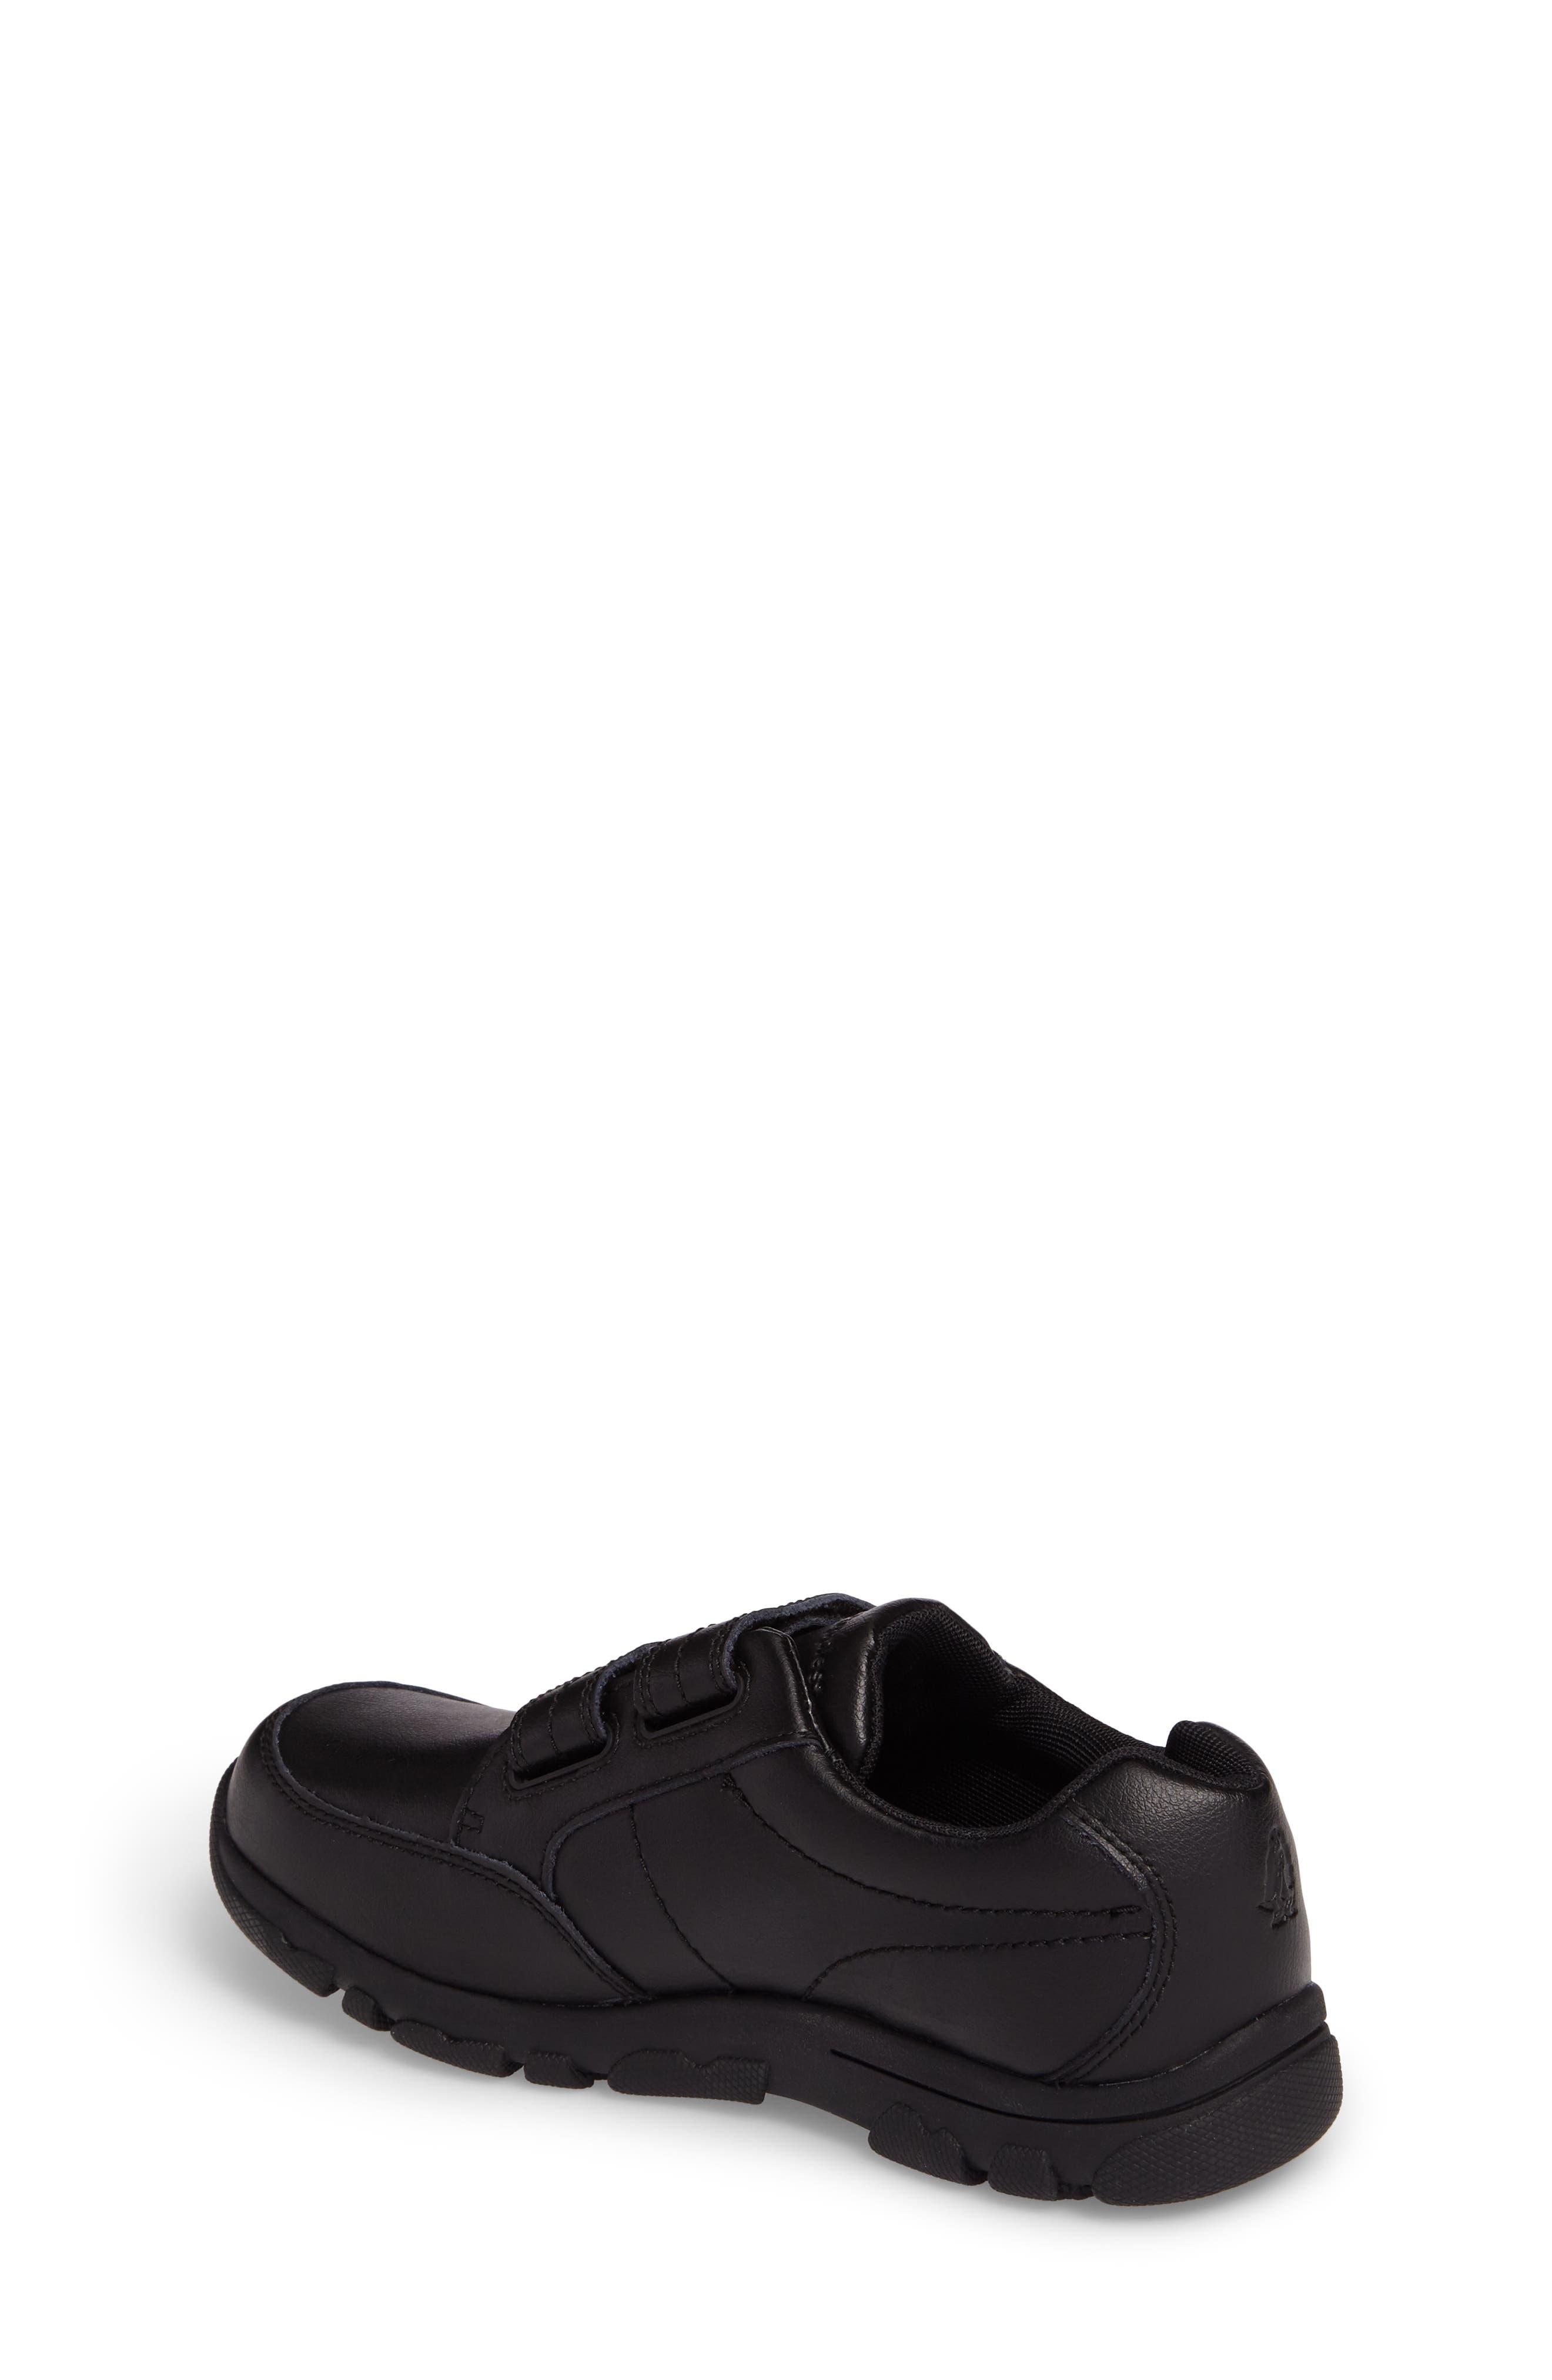 Jace Dress Sneaker,                             Alternate thumbnail 2, color,                             Black Leather